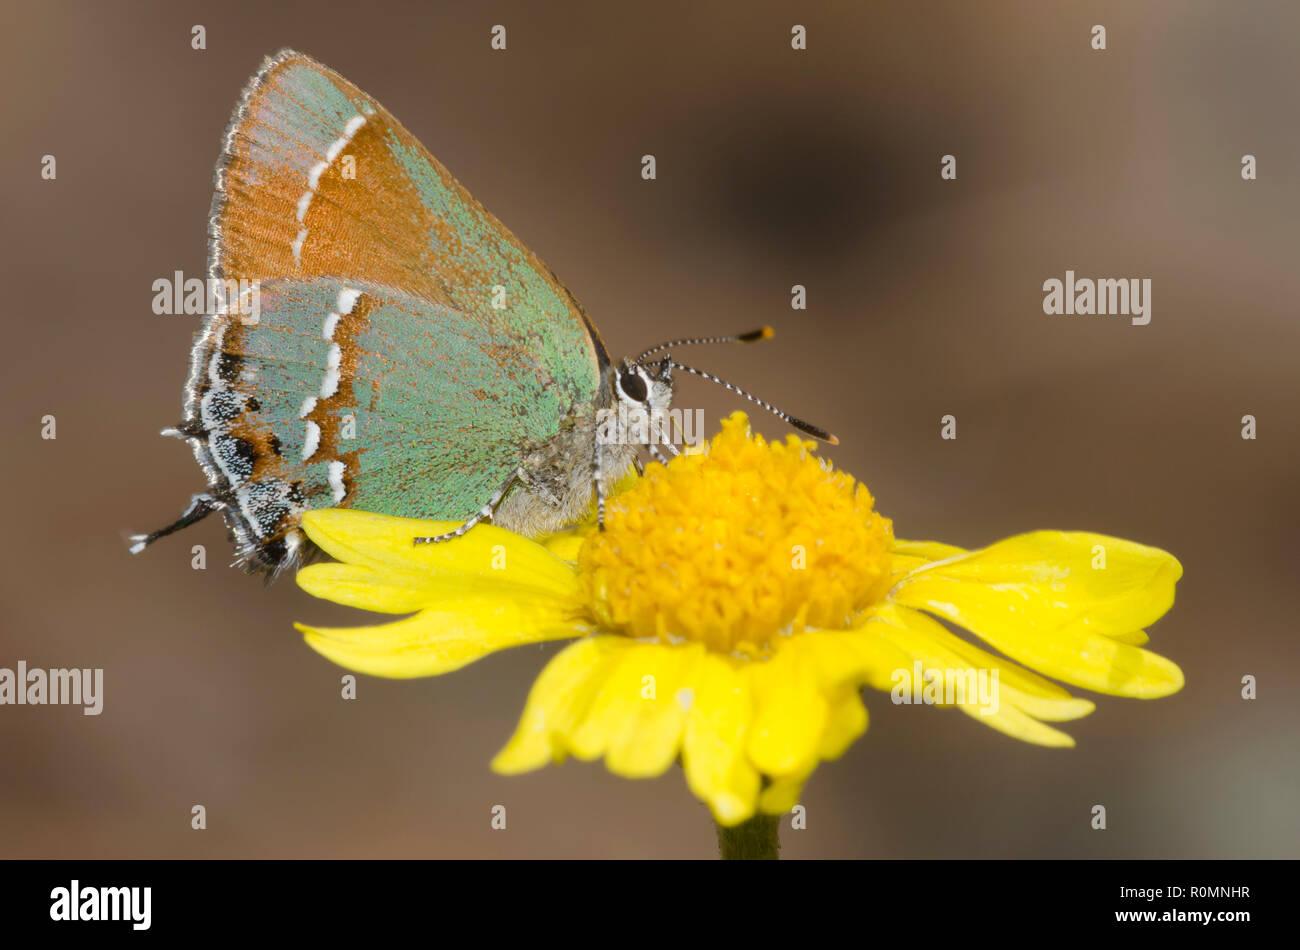 Juniper Hairstreak, Callophrys gryneus, nectaring auf Stemmy vier - nerv Daisy, Tetraneuris scaposa Stockfoto